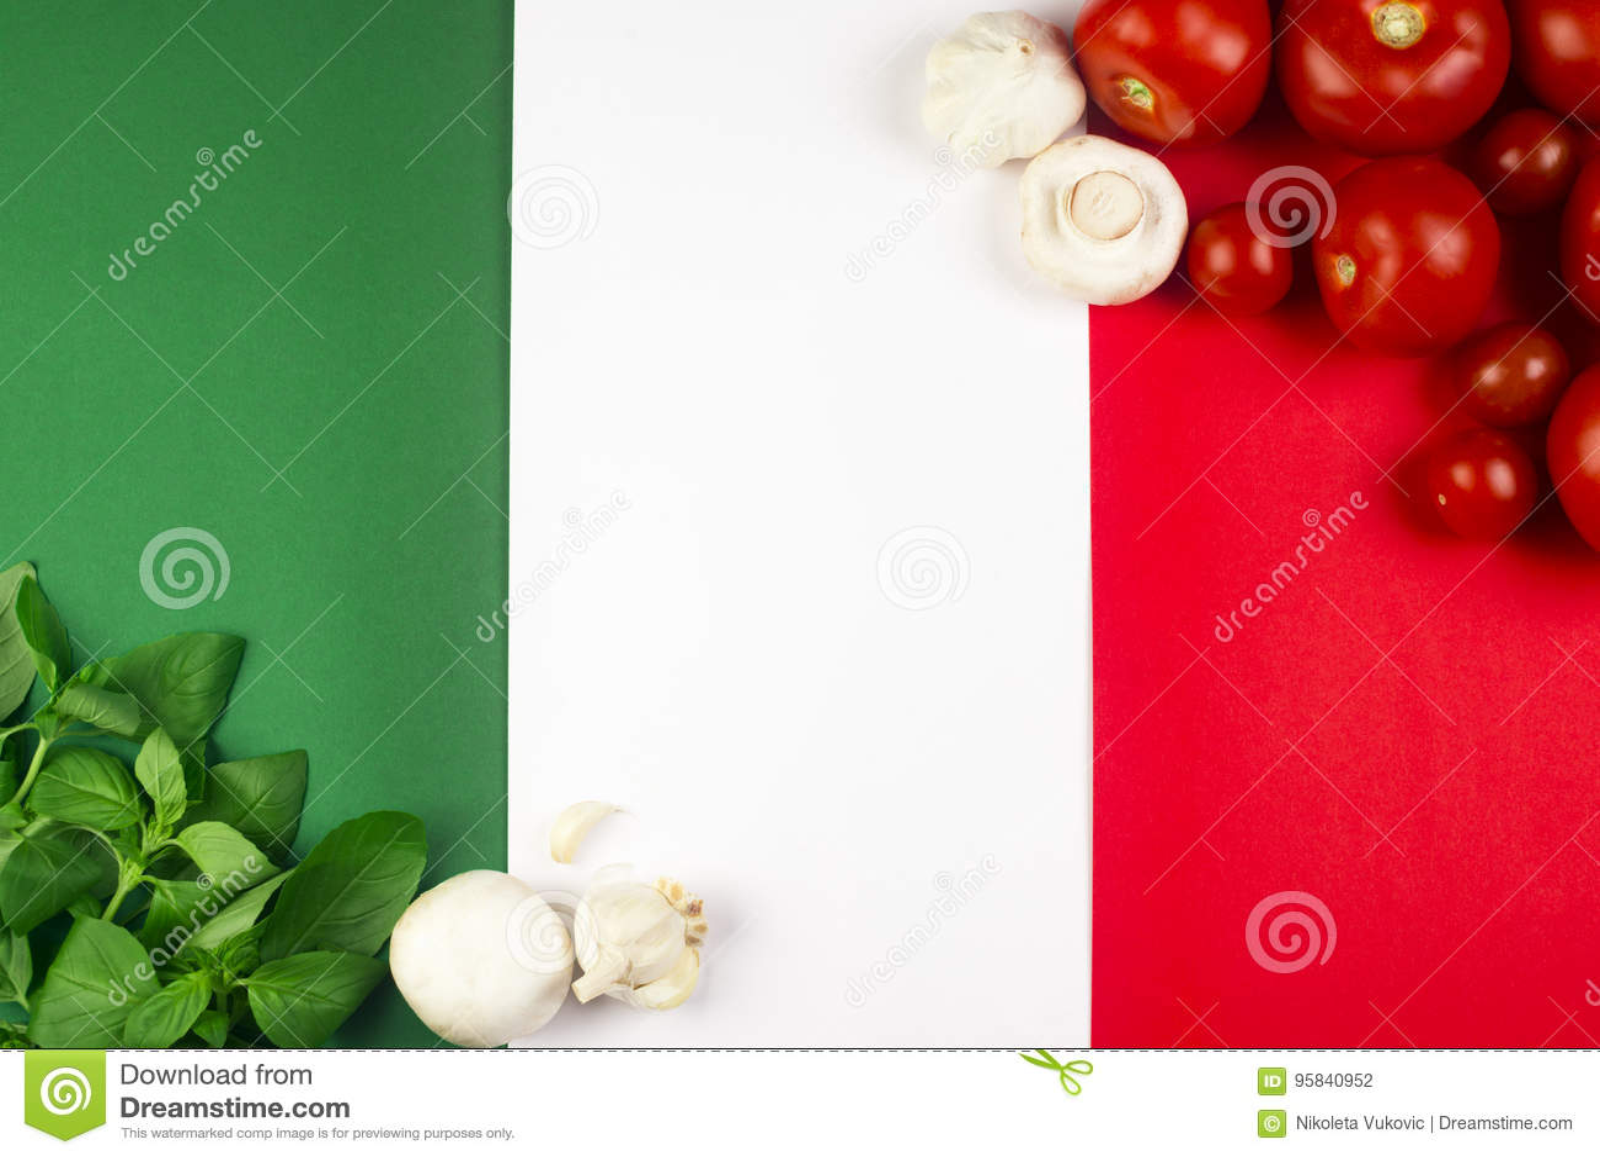 Italian flag with food